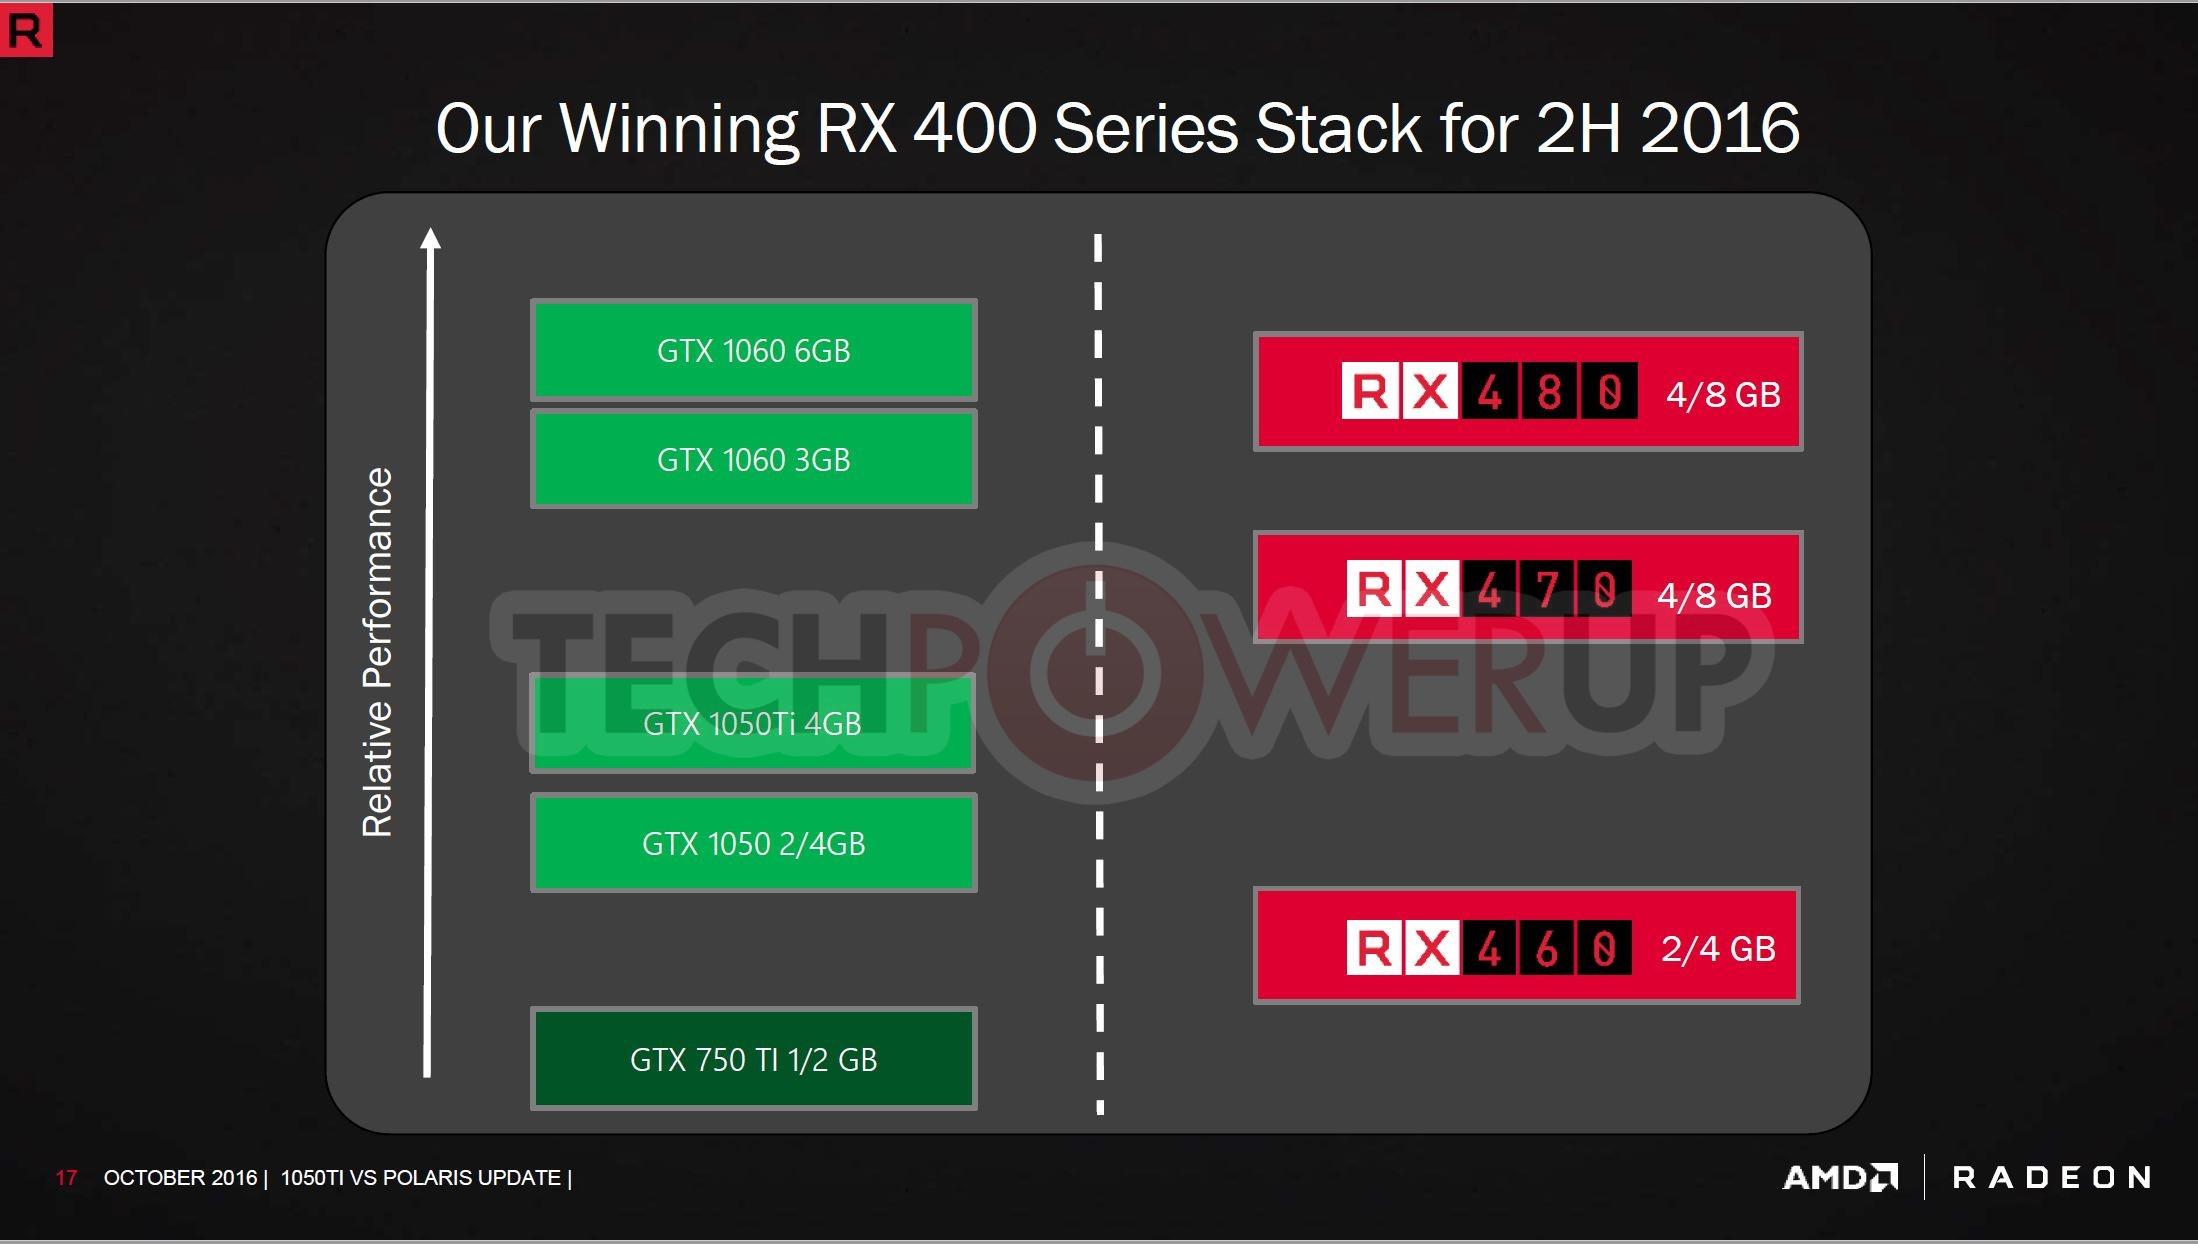 AMD снизила цены RX 470 и RX 460 в ответ на анонс GTX 1050 Ti